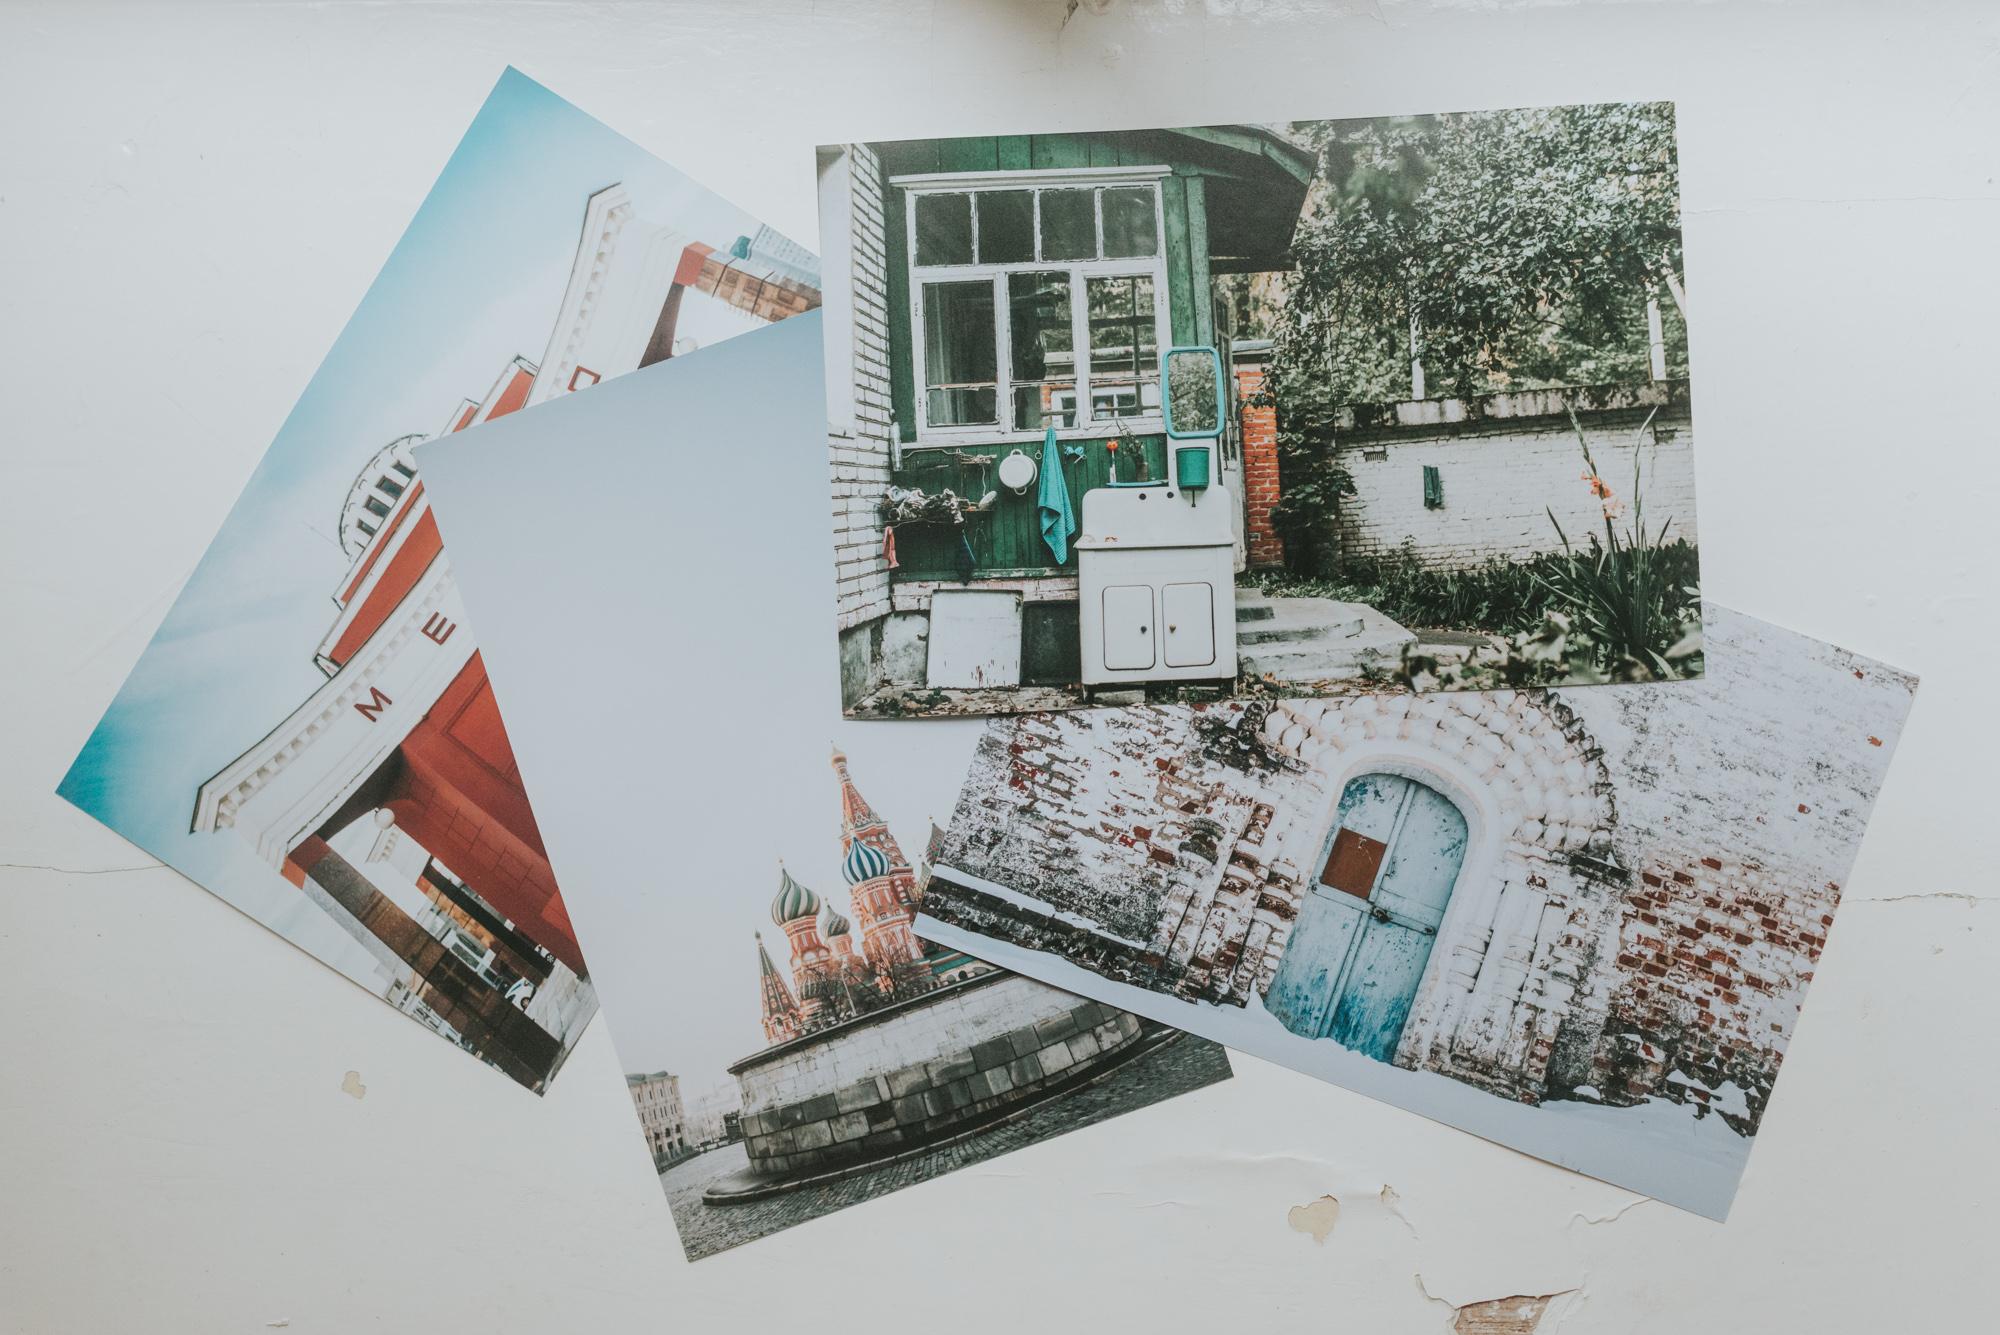 Prints - professional photographic prints | silk photo paper15 x 22.5 - 450 Rub20x30 - 1000 Rub | Framed - 1800 Rub30x40 2000 Rub | Framed - 3000 Rub15x15 - 450 Rub | Framed - 1100 Rub30x30 - 1300 Rub | Framed - /2800 Rub